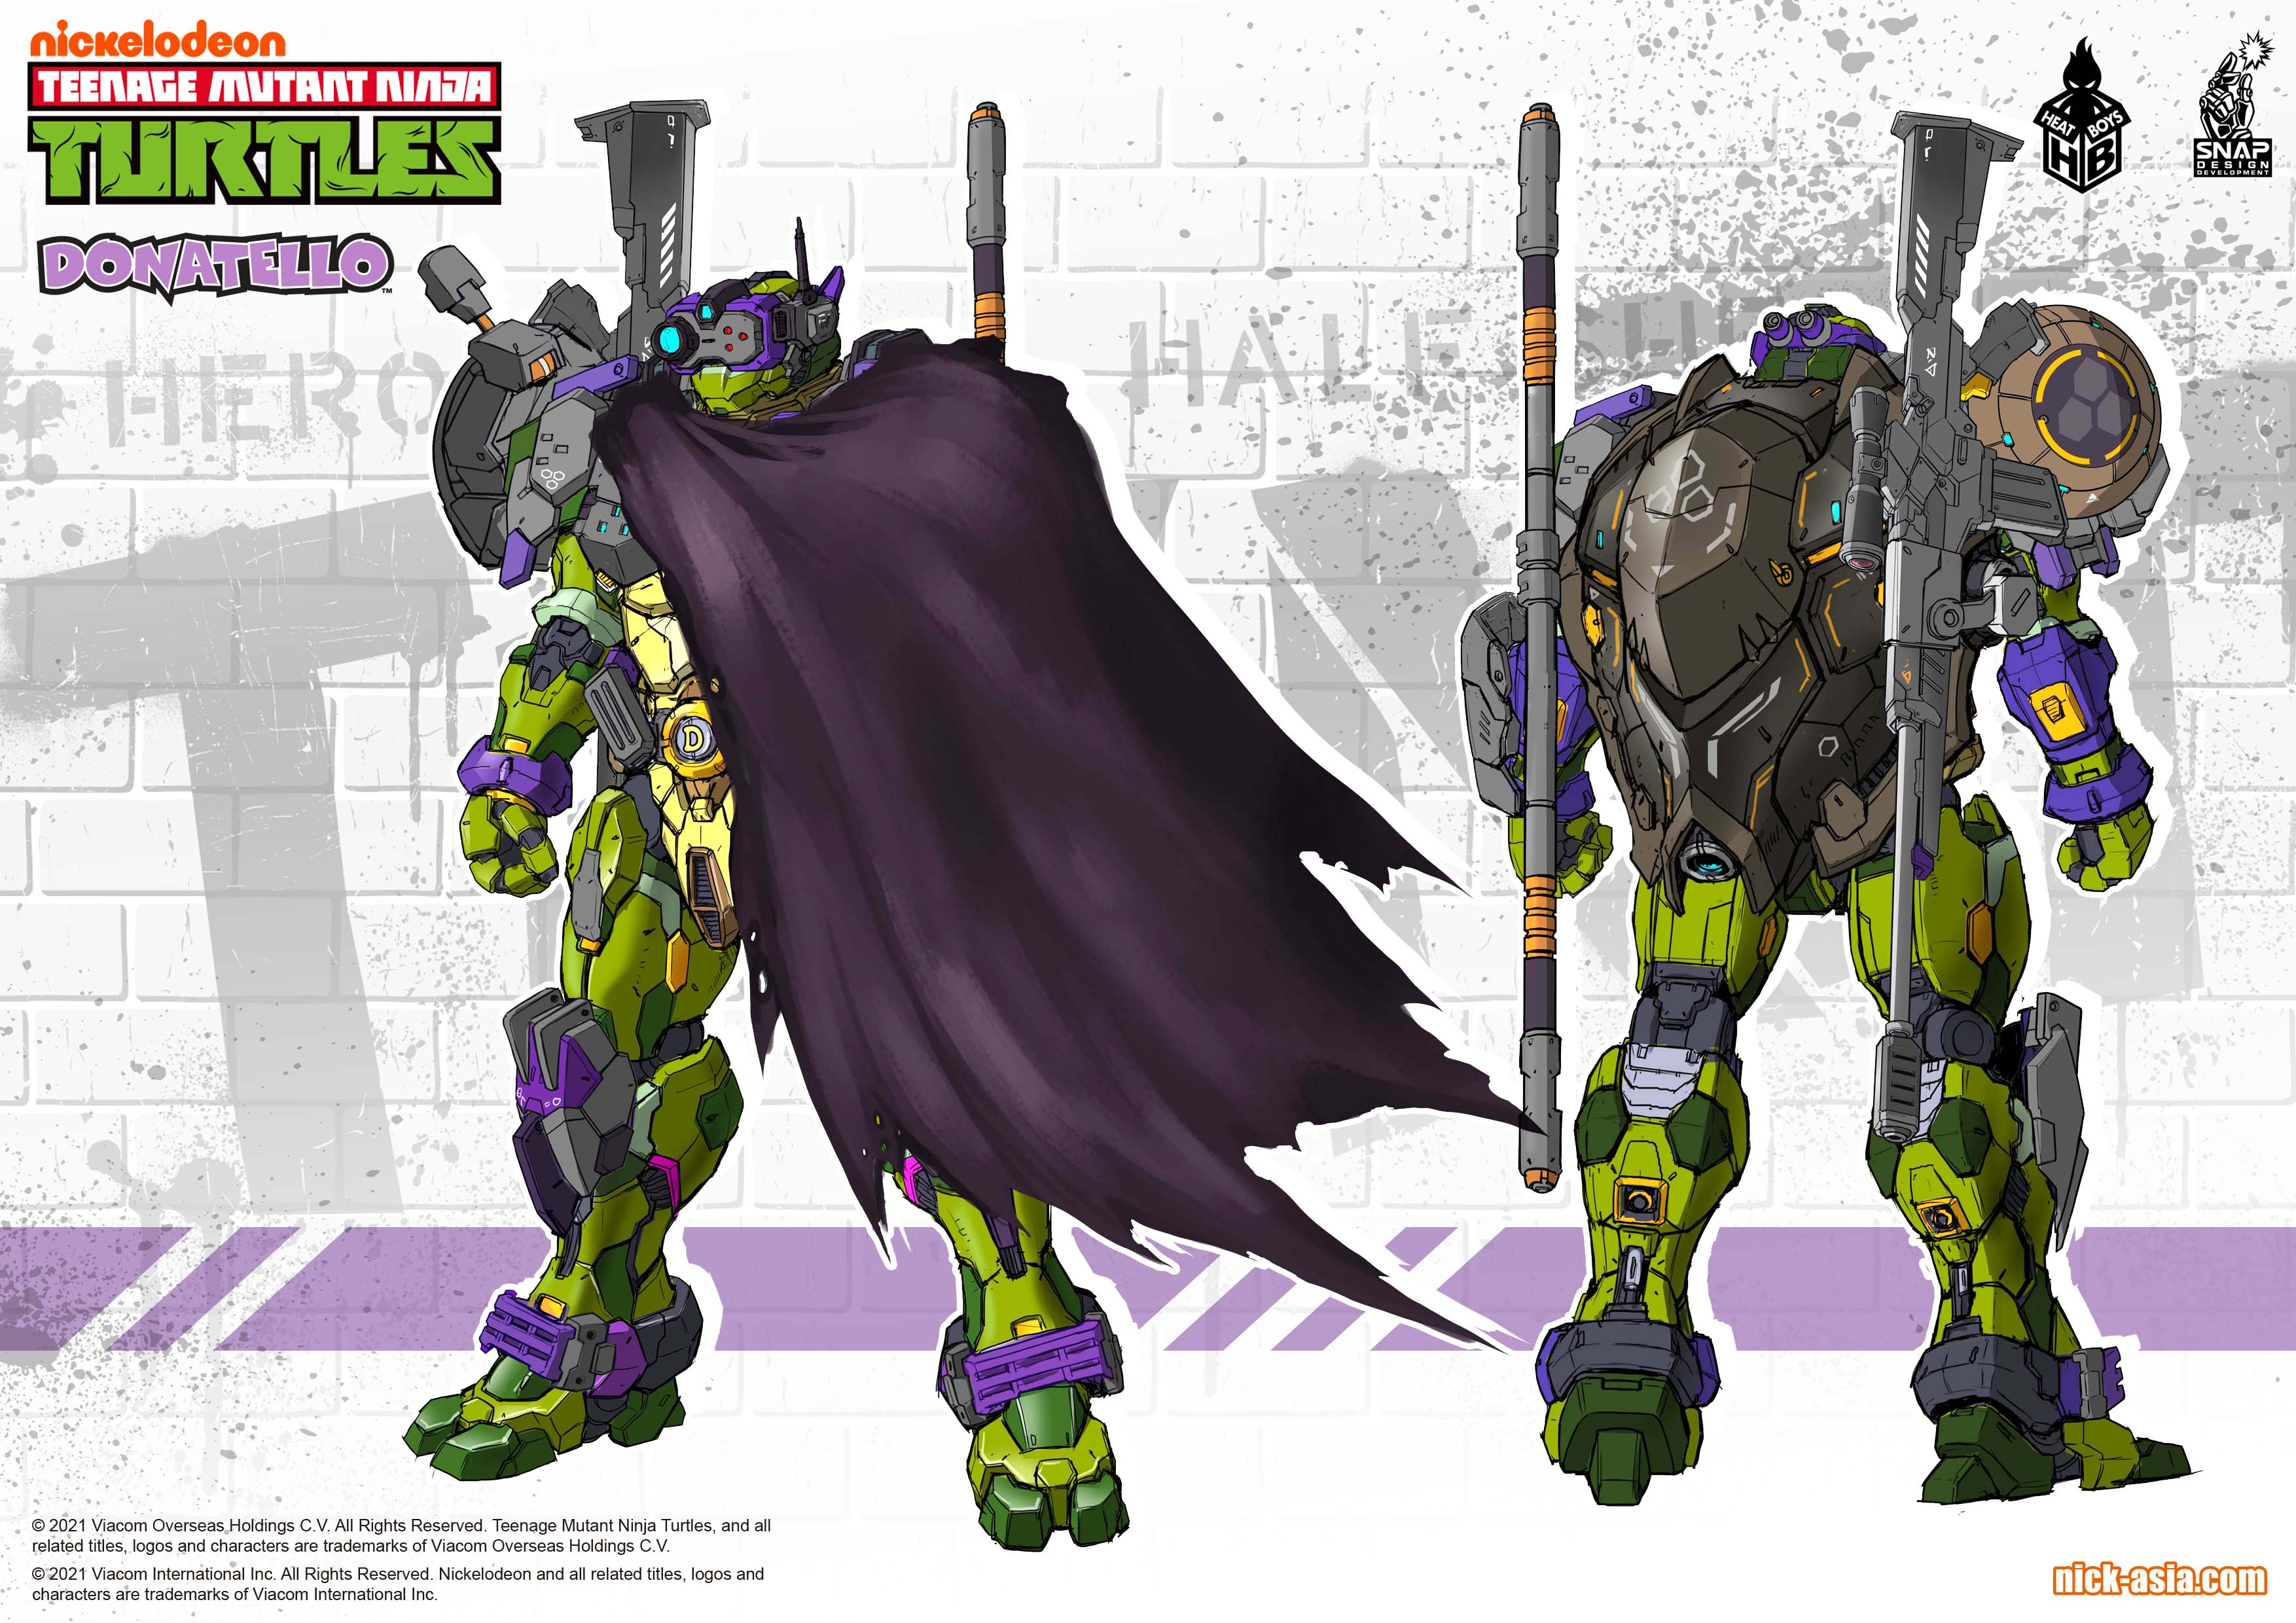 Link a Teenage Mutant Ninja Turtles prototipo per le Turtles robotiche di Heat Boys x Snap Desing – (4)